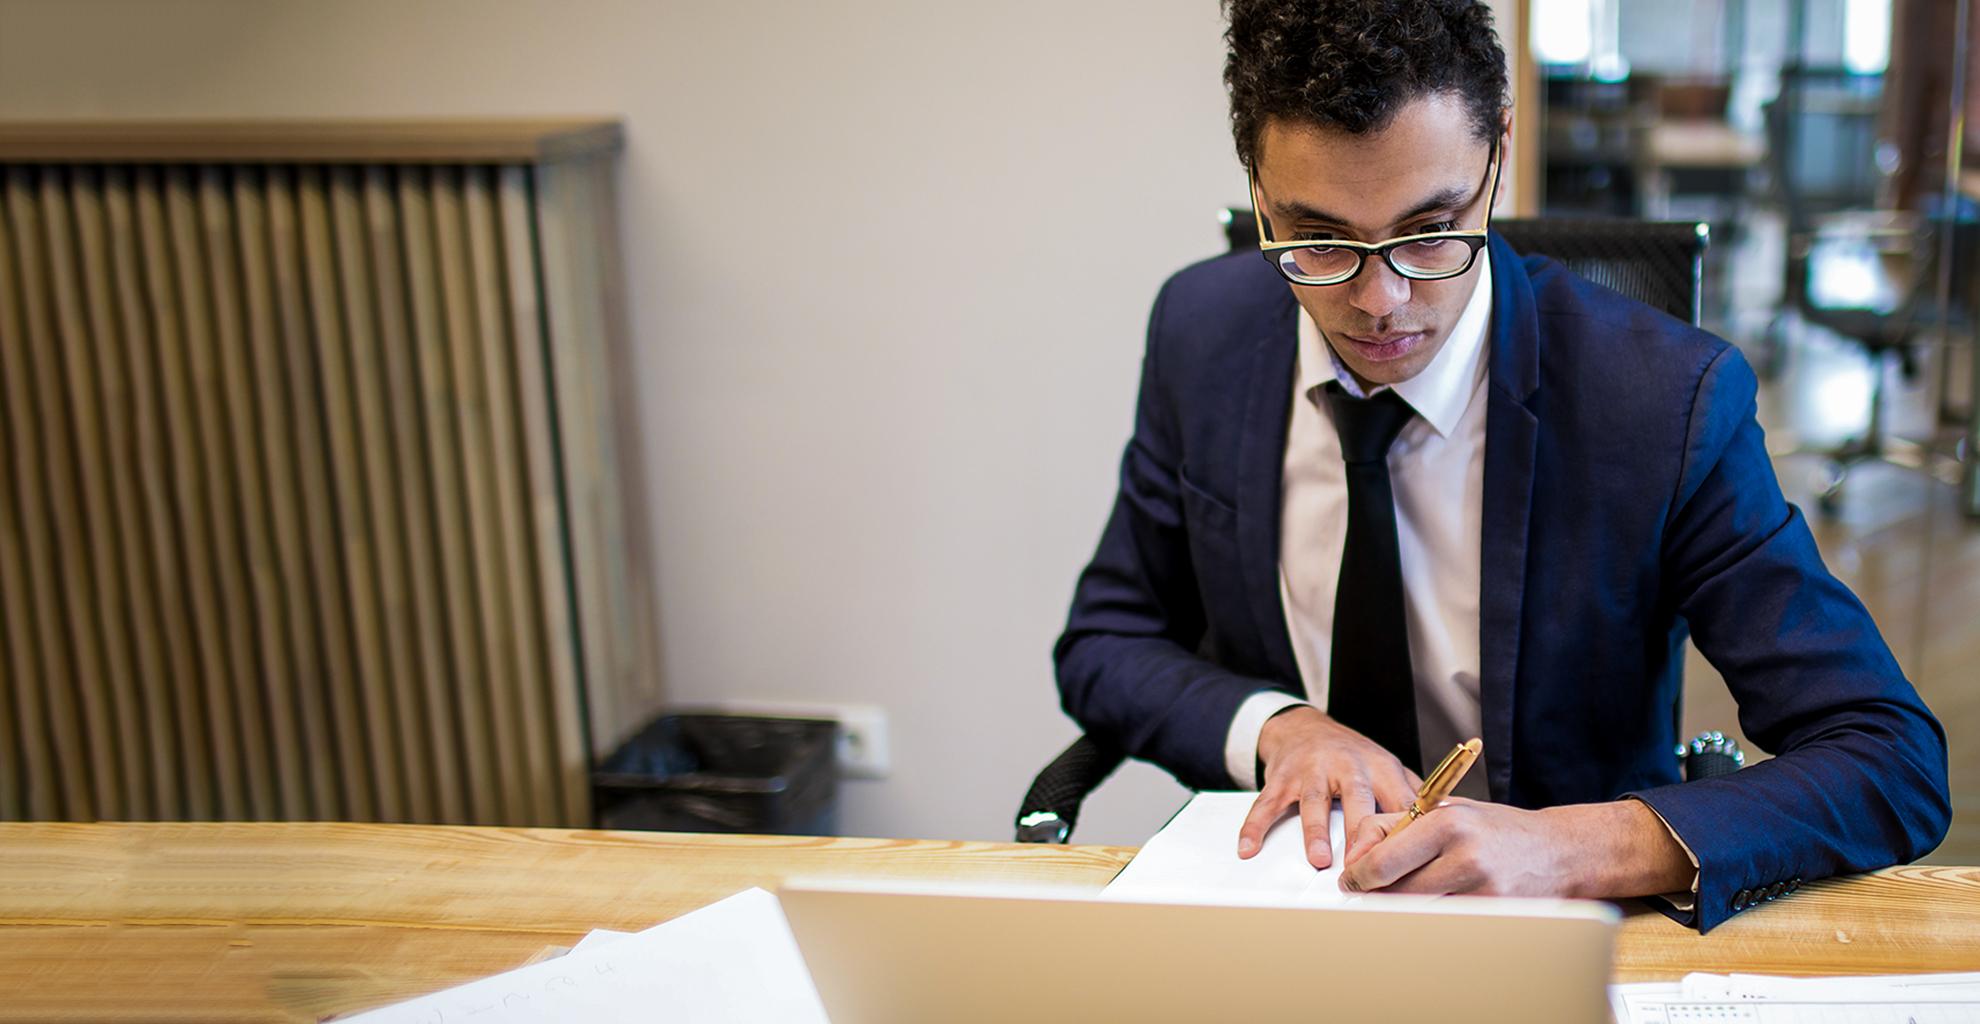 Man focuses on Regulatory Compliance